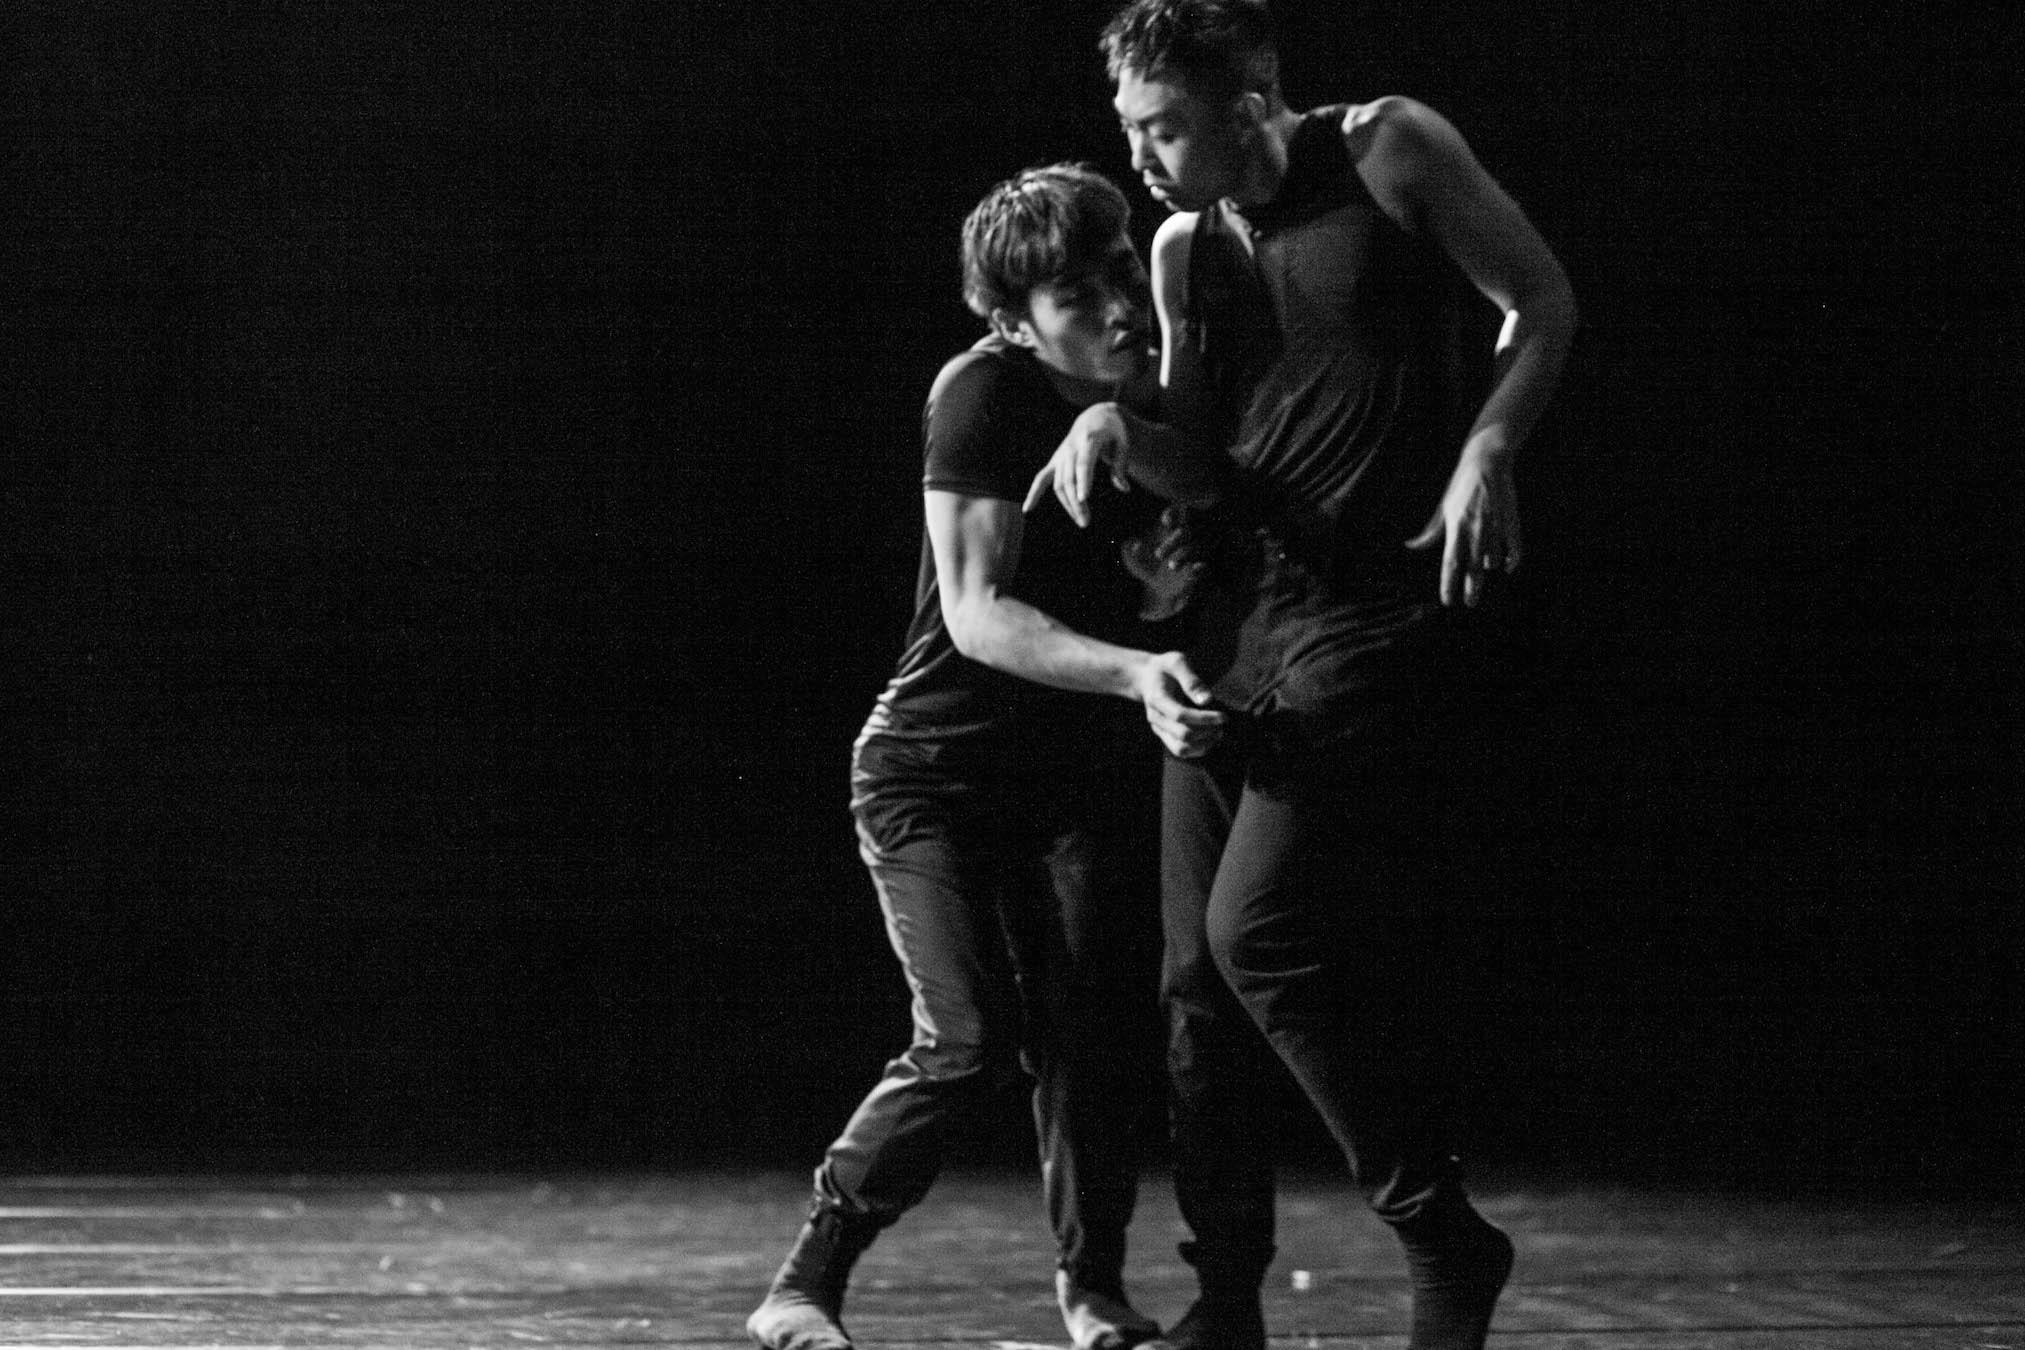 https://www.danzaurbana.eu/associazione/wp-content/uploads/2018/05/Masdanza_Hugin_Munin_2016.jpg